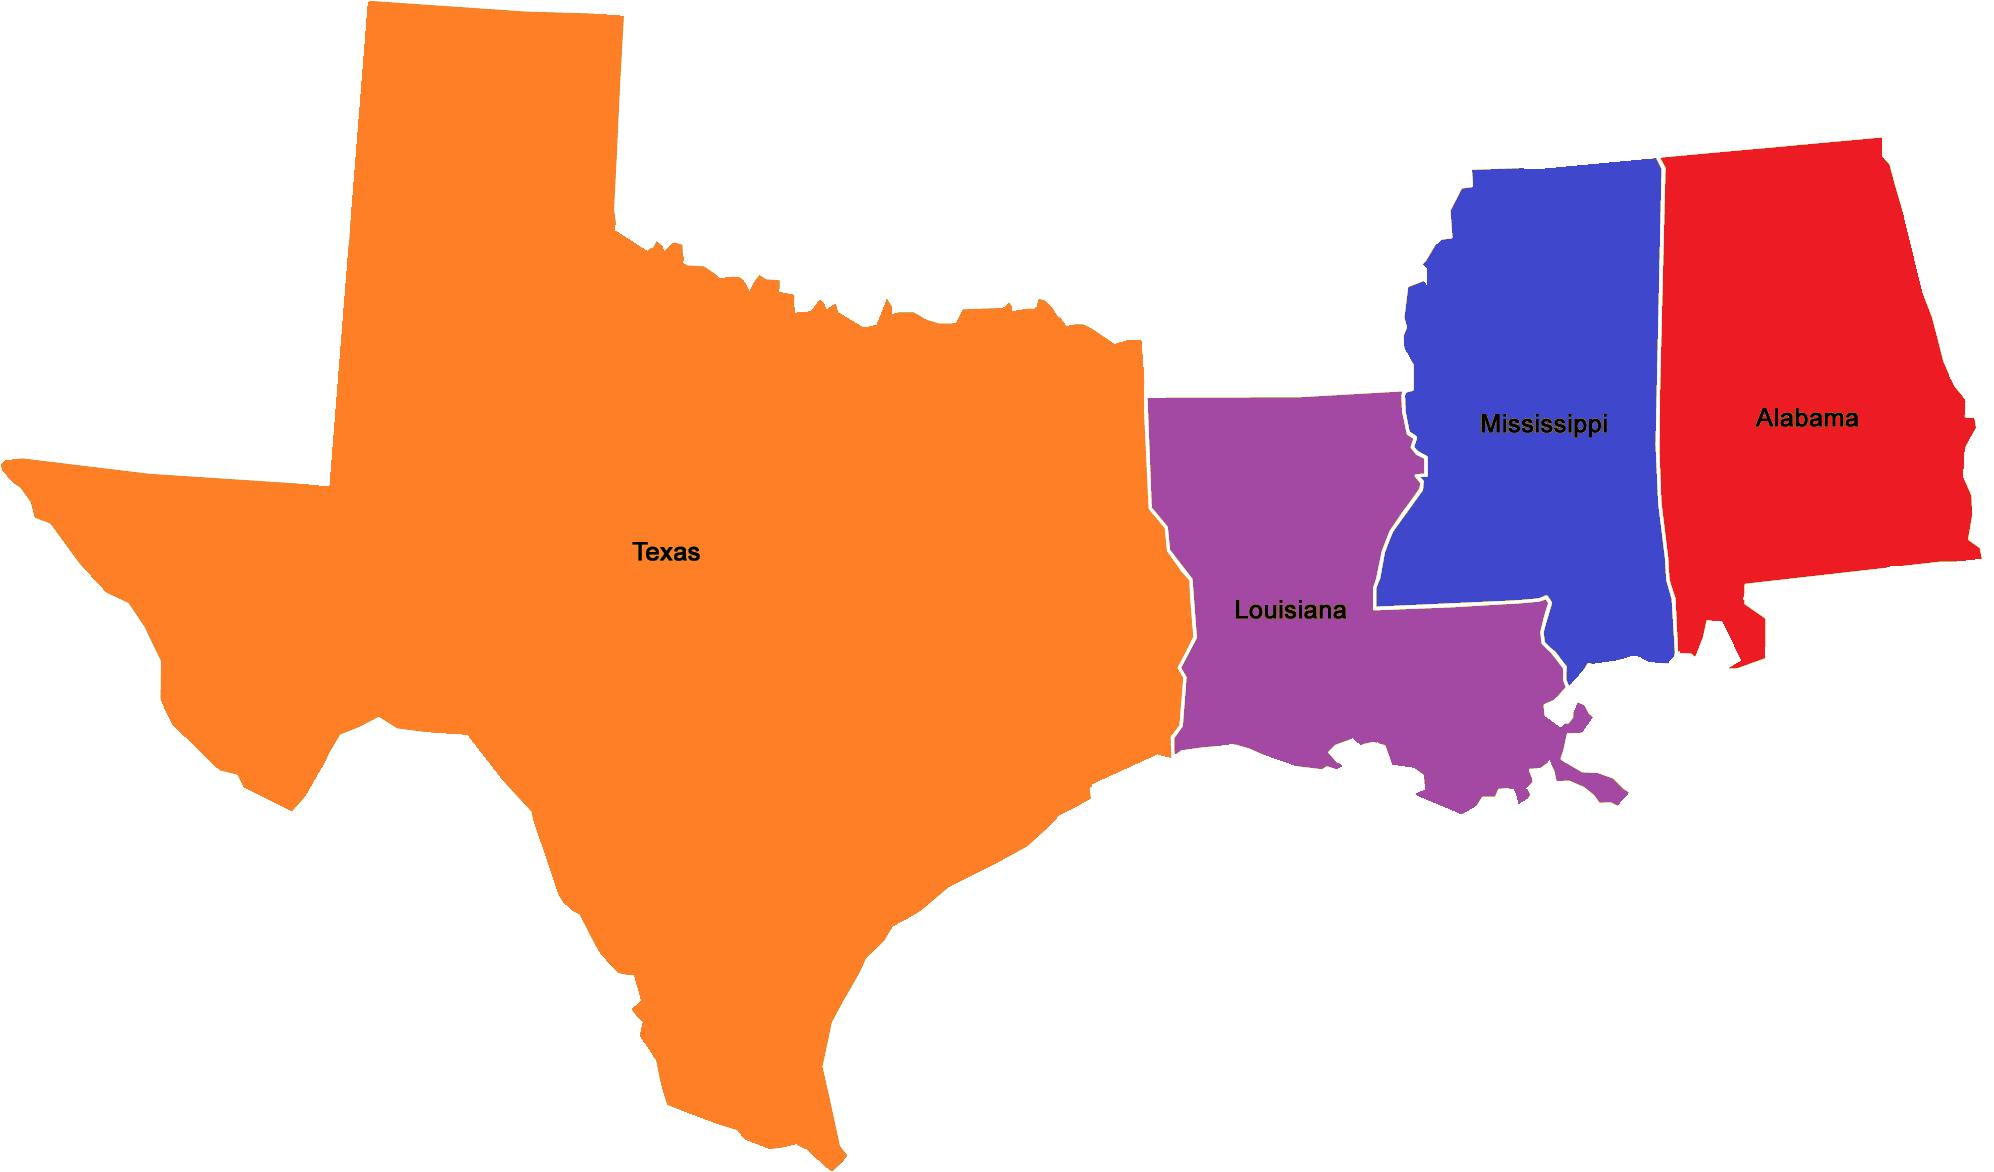 Map - Texas - Louisiana - Mississippi - Alabama